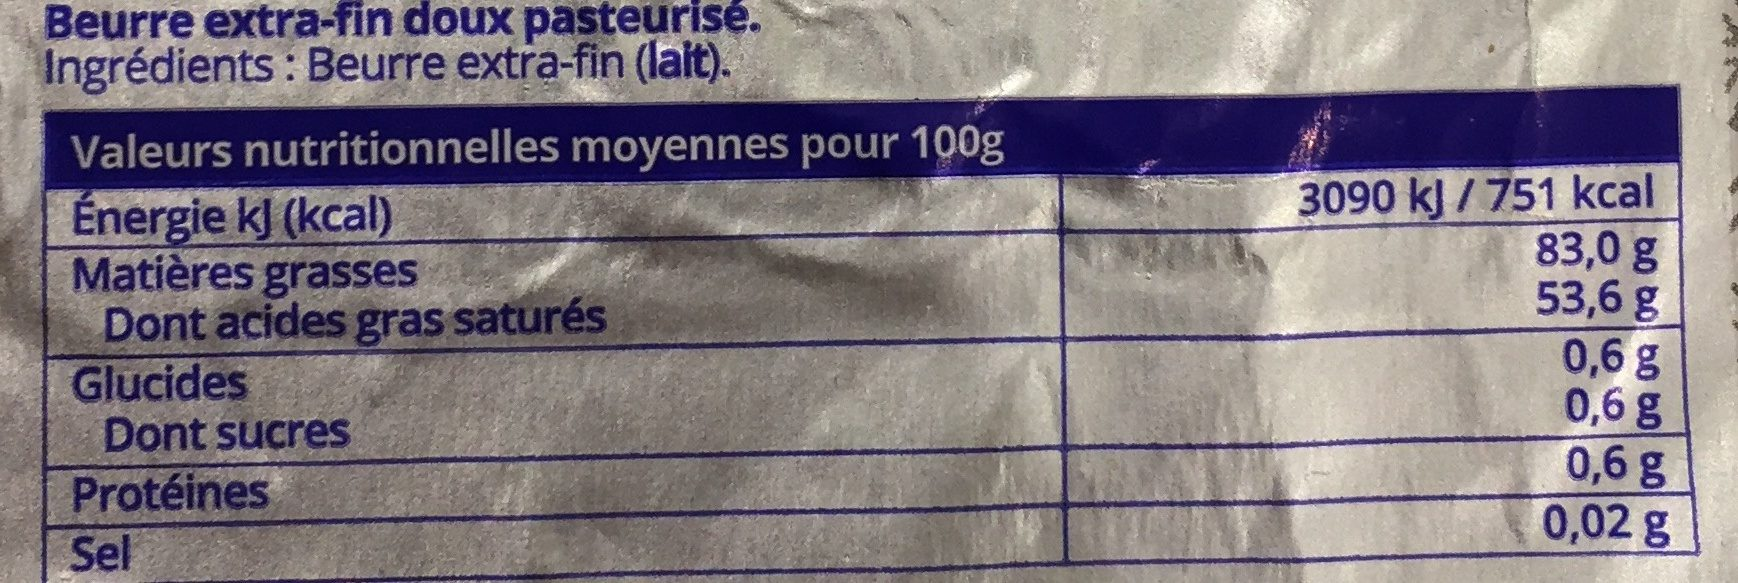 Beurre Extra-Fin - Información nutricional